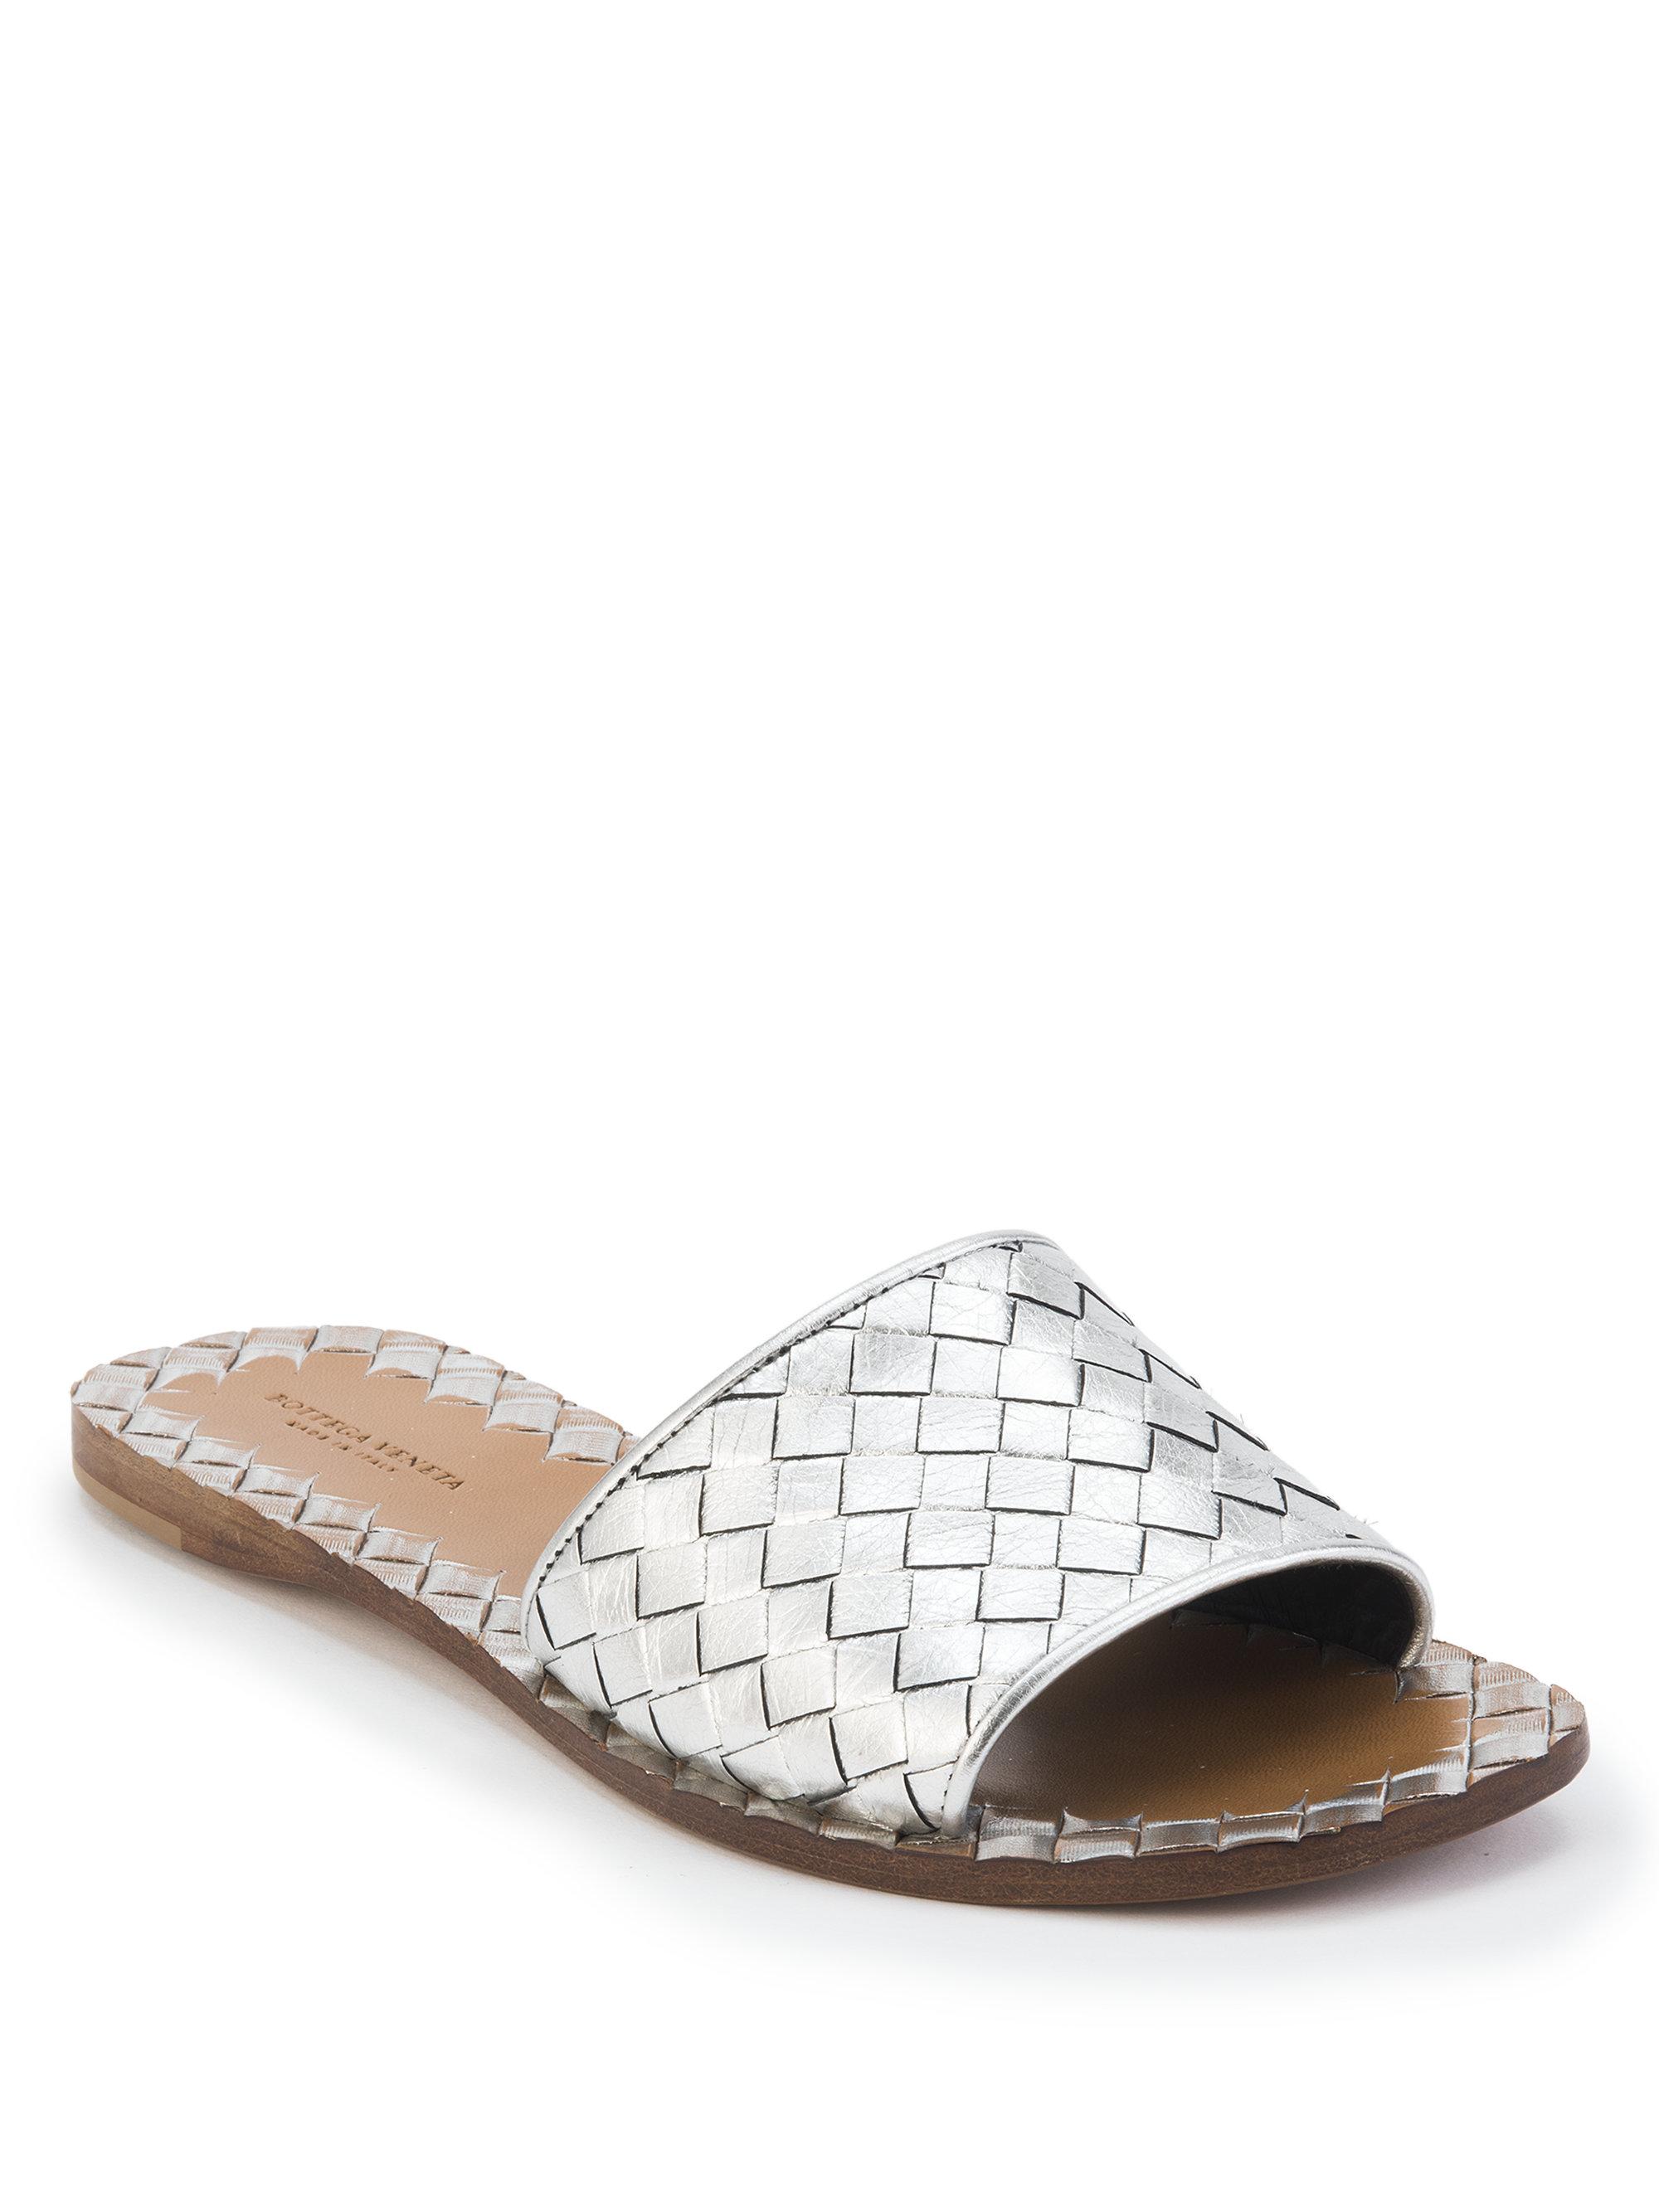 Lyst Bottega Veneta Woven Leather Slides In Metallic